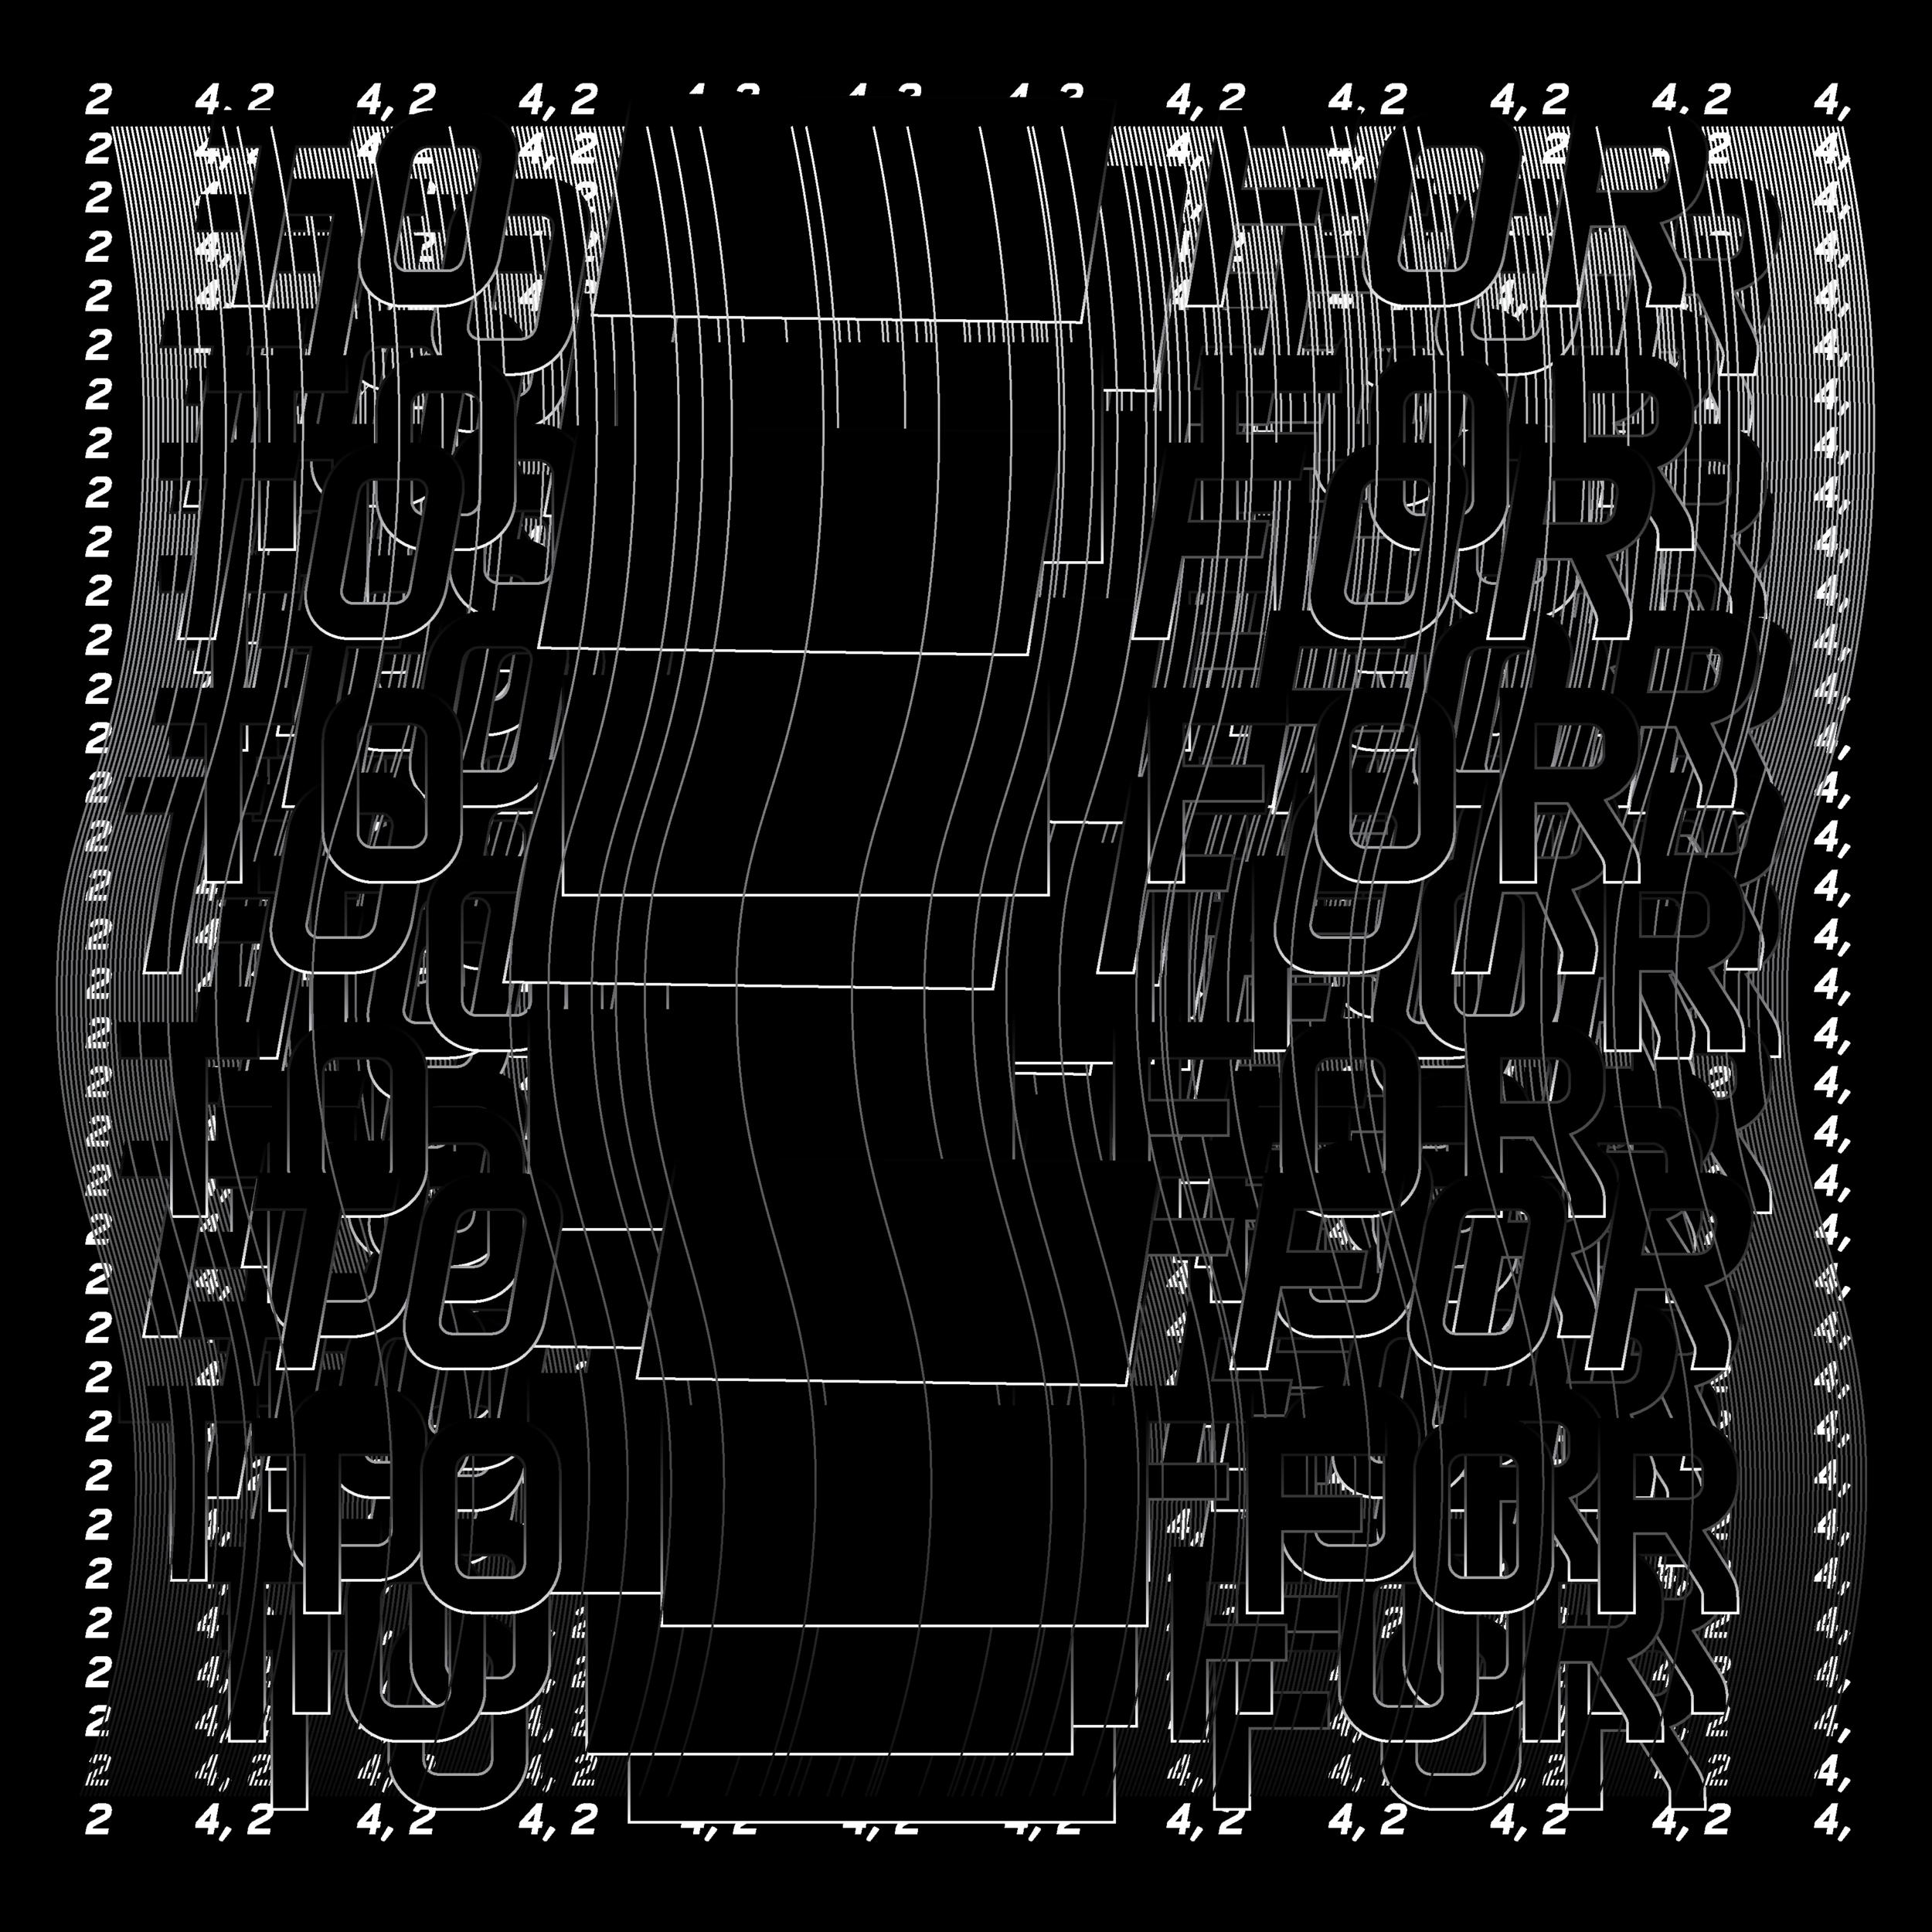 sonic_jeel_visuals-14.png